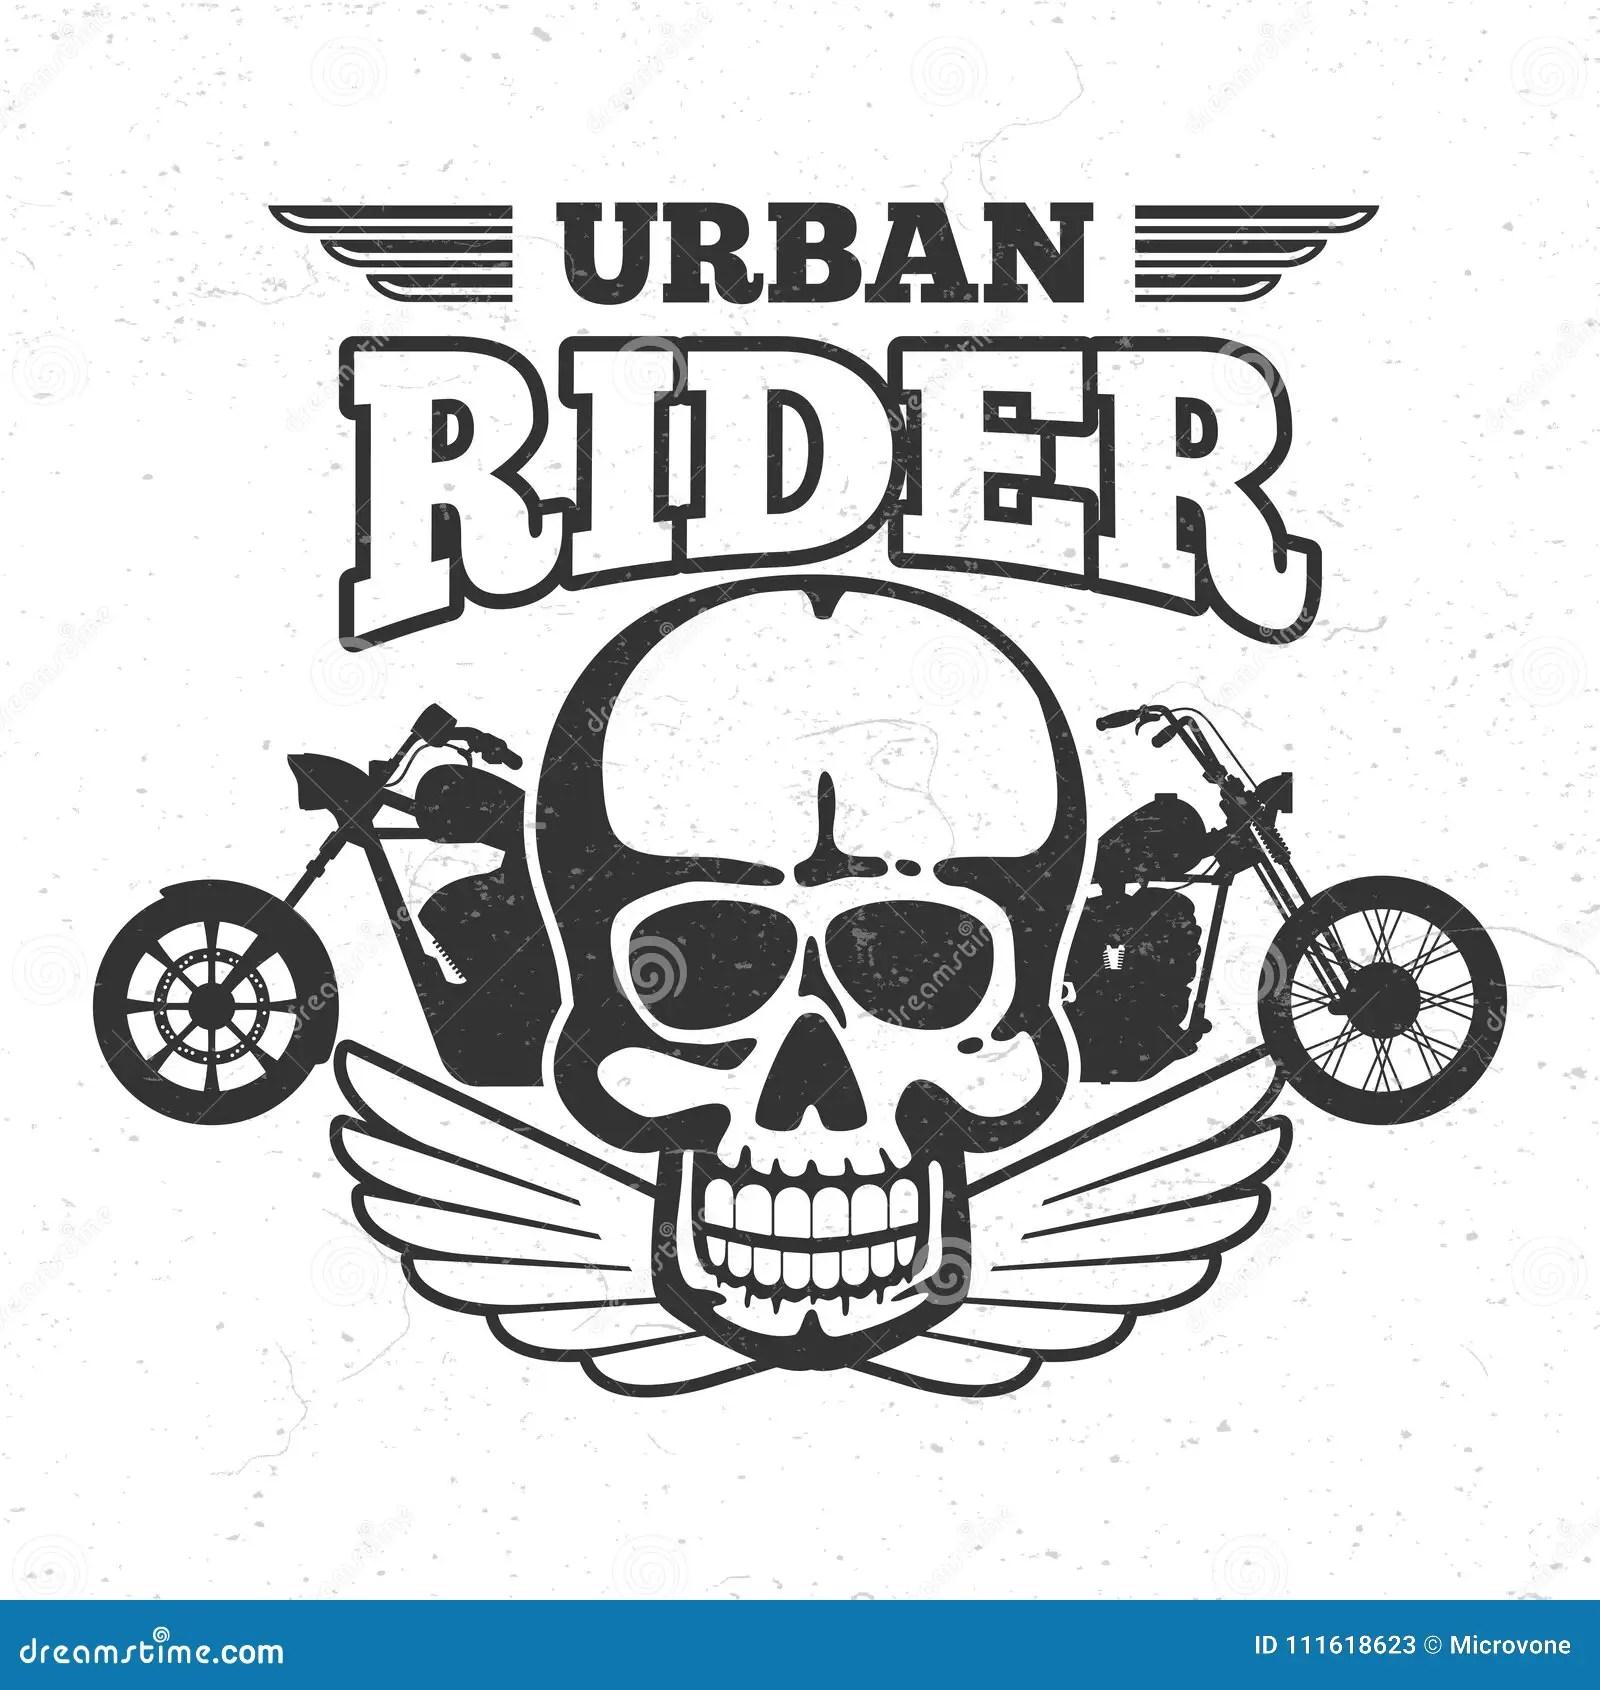 Motorbike Club Vintage Embem With Motorcycle And Skull